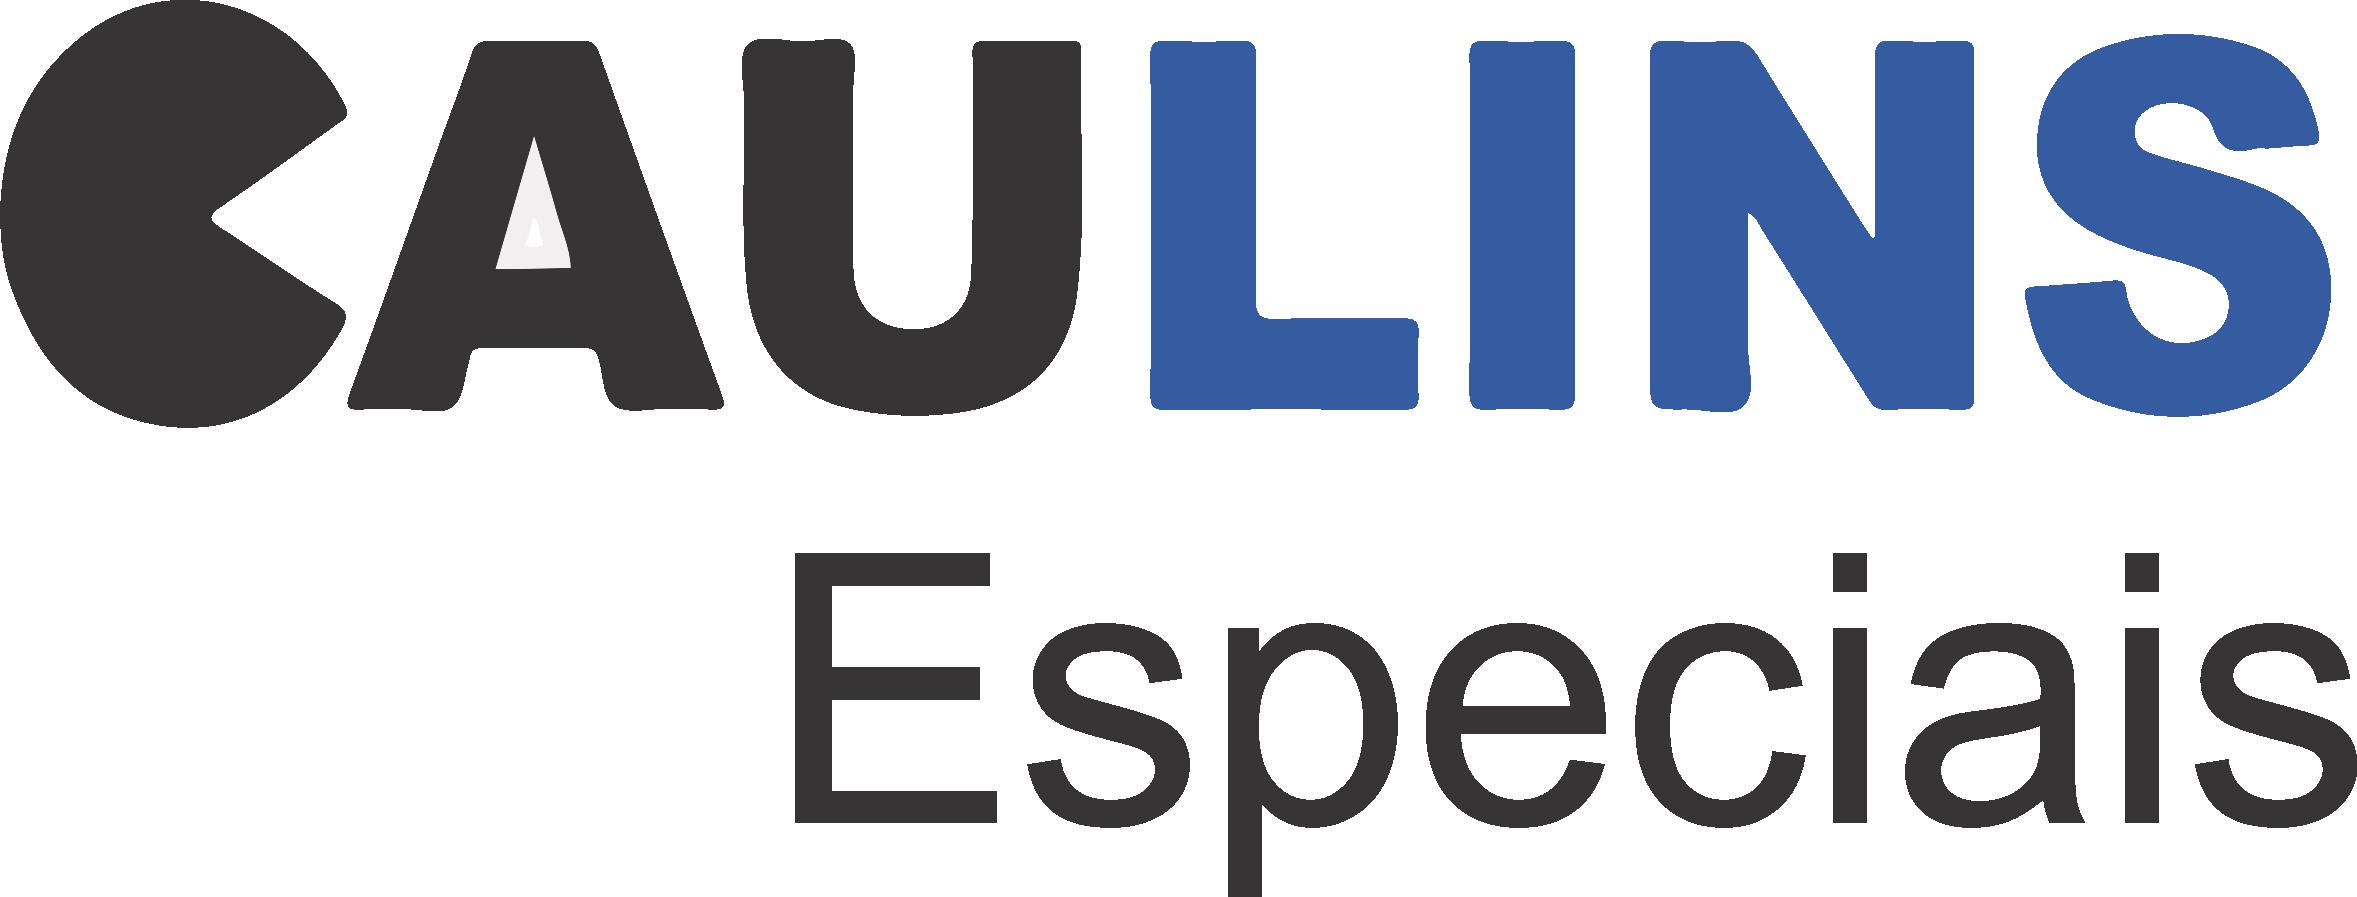 Logo Caulins